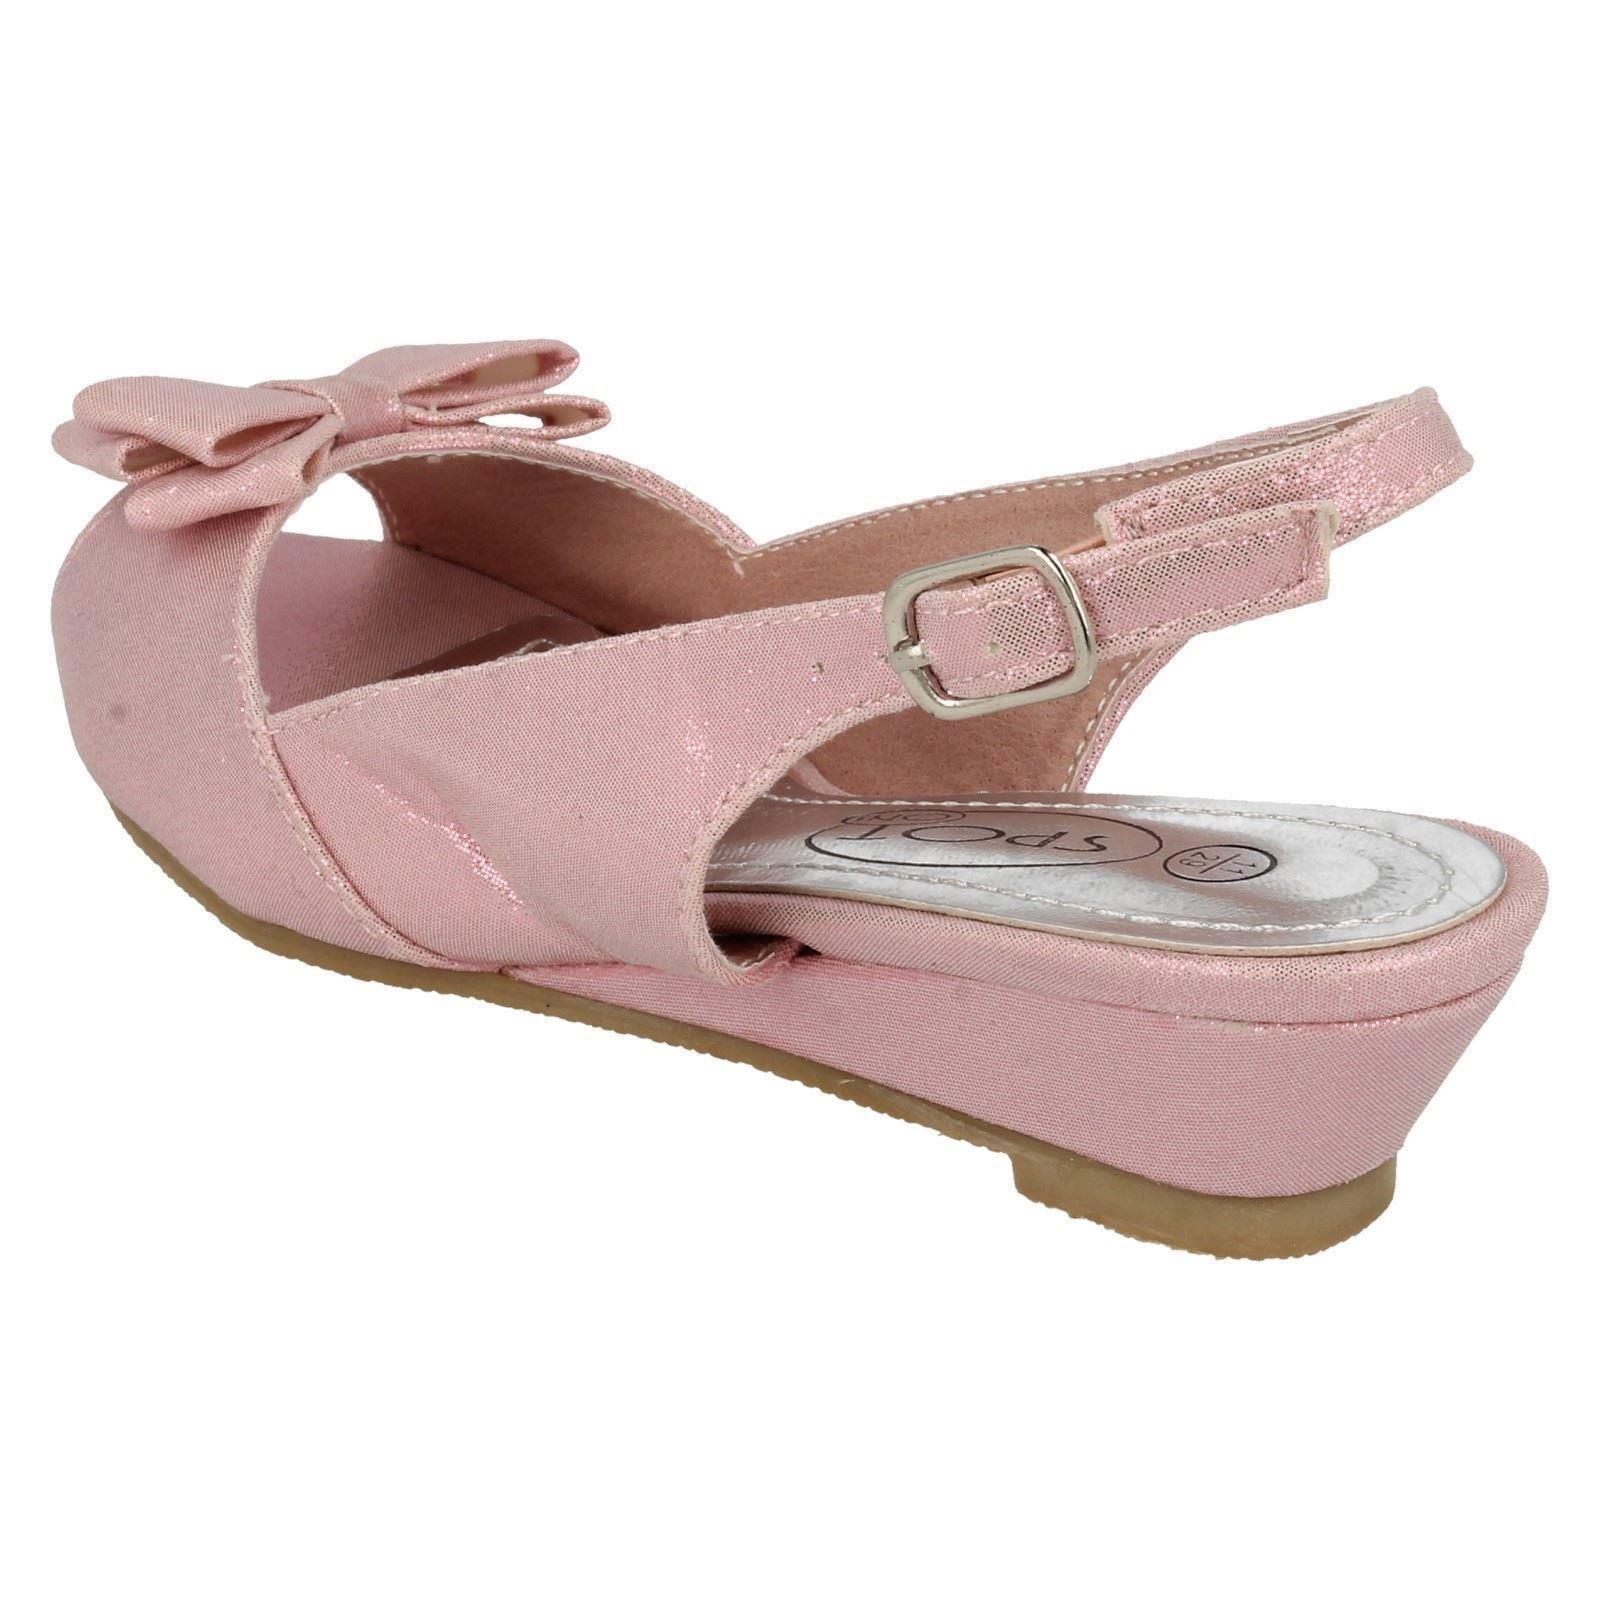 Niñas Spot on Peep Toe Fiesta Zapatos H1089